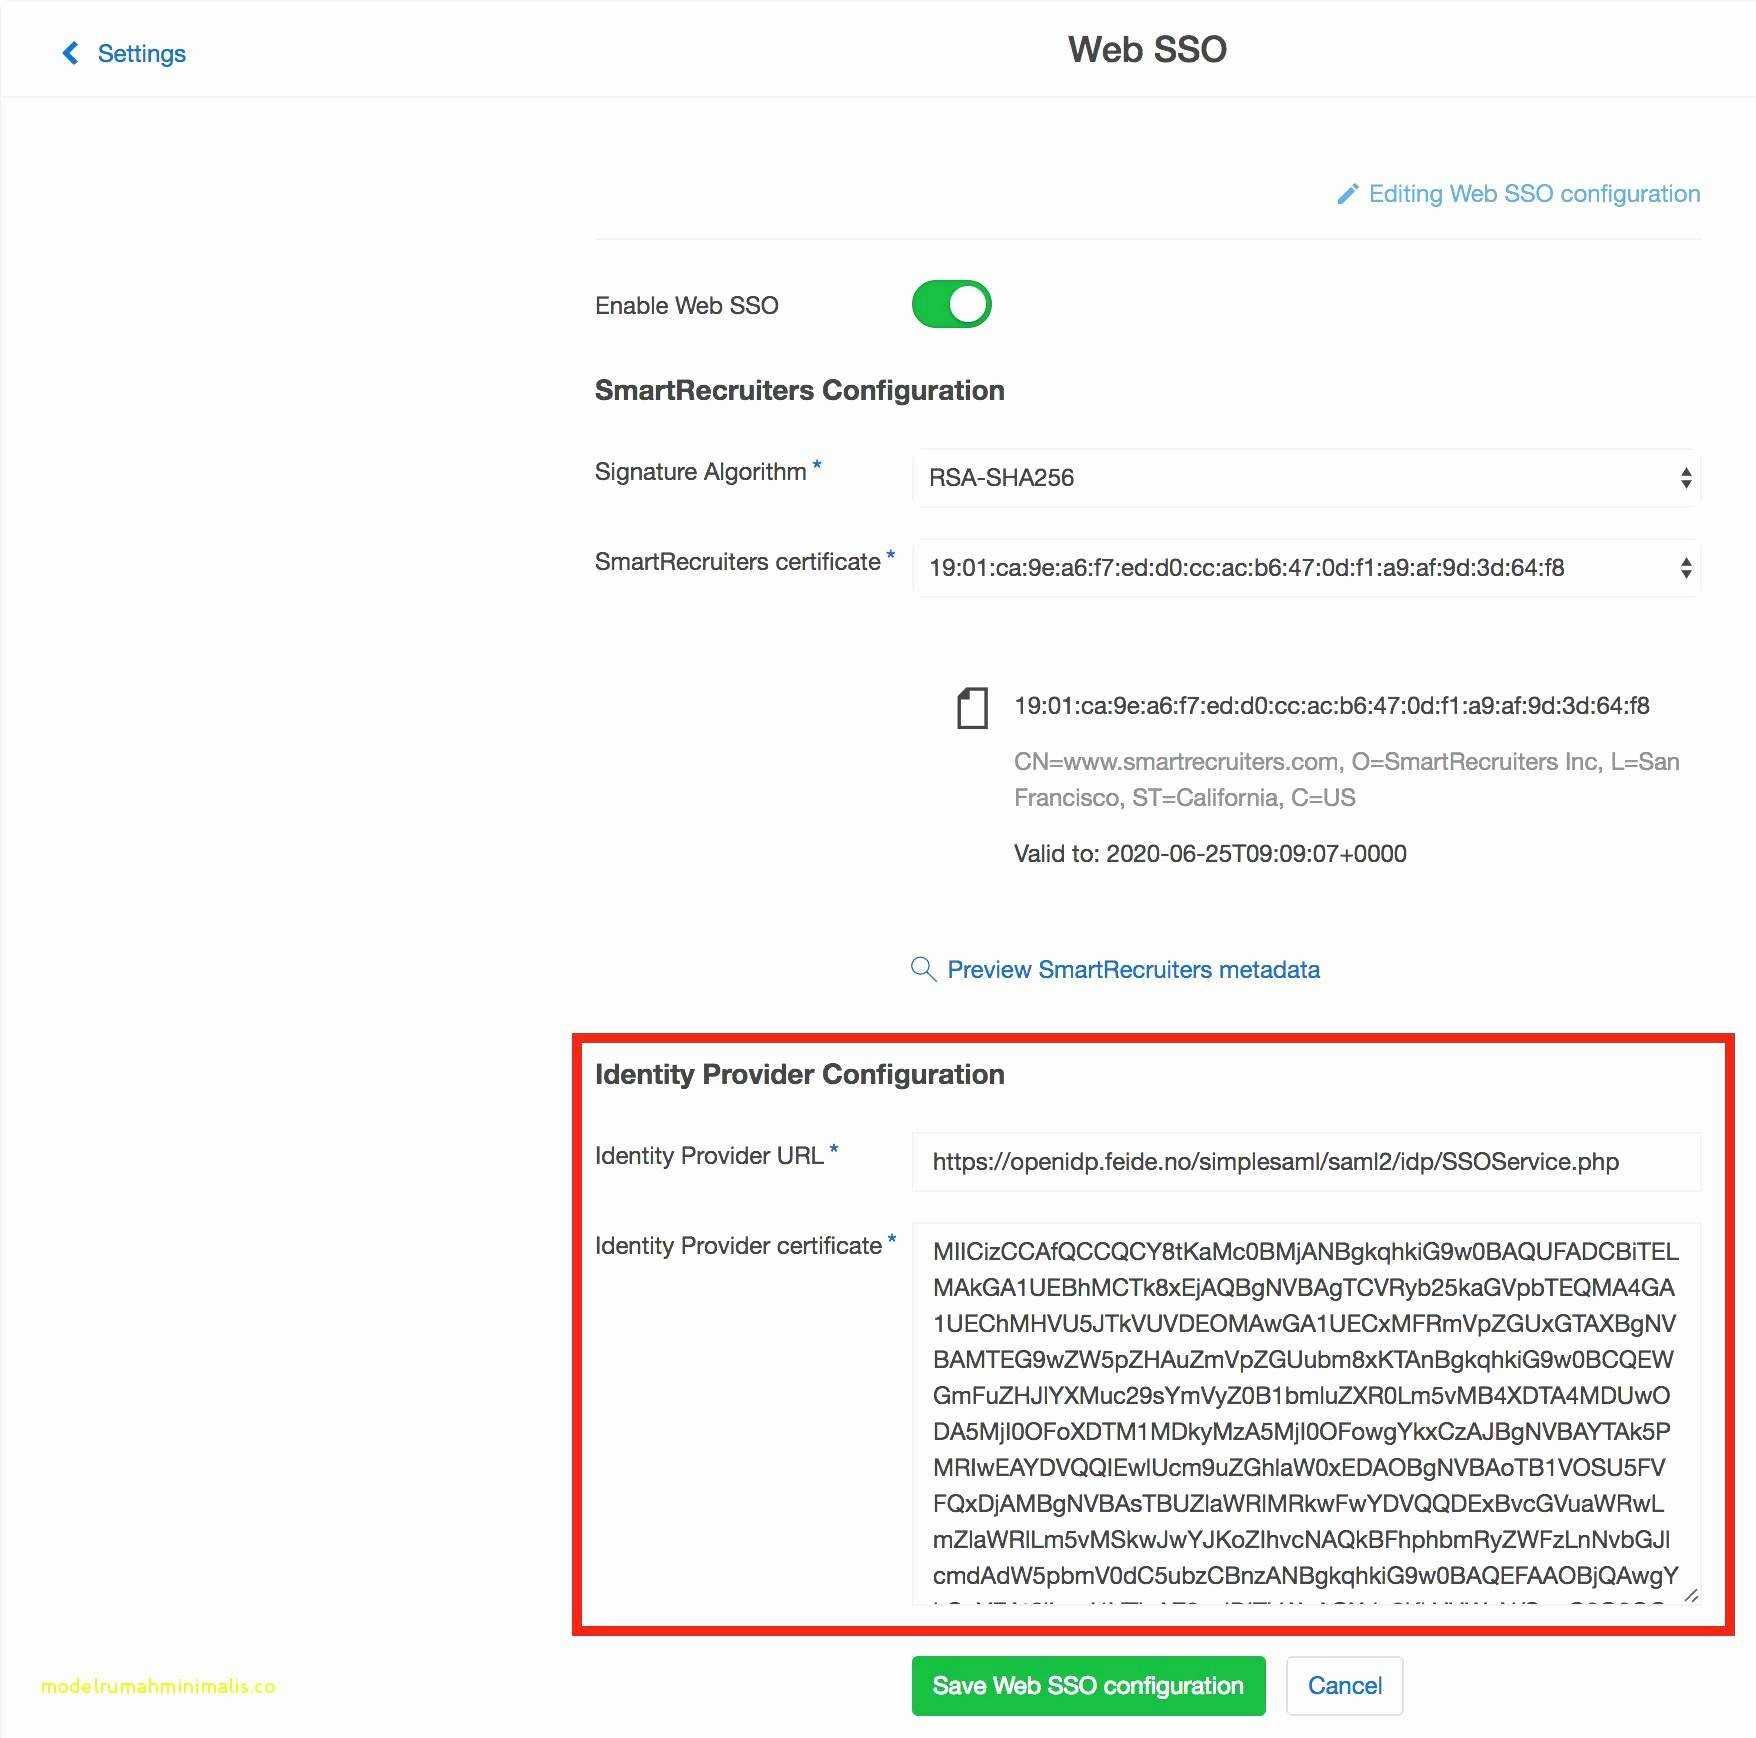 Linen Inventory Spreadsheet Or Großzügig Beispiel Tracking Sheet Inside Linen Inventory Spreadsheet